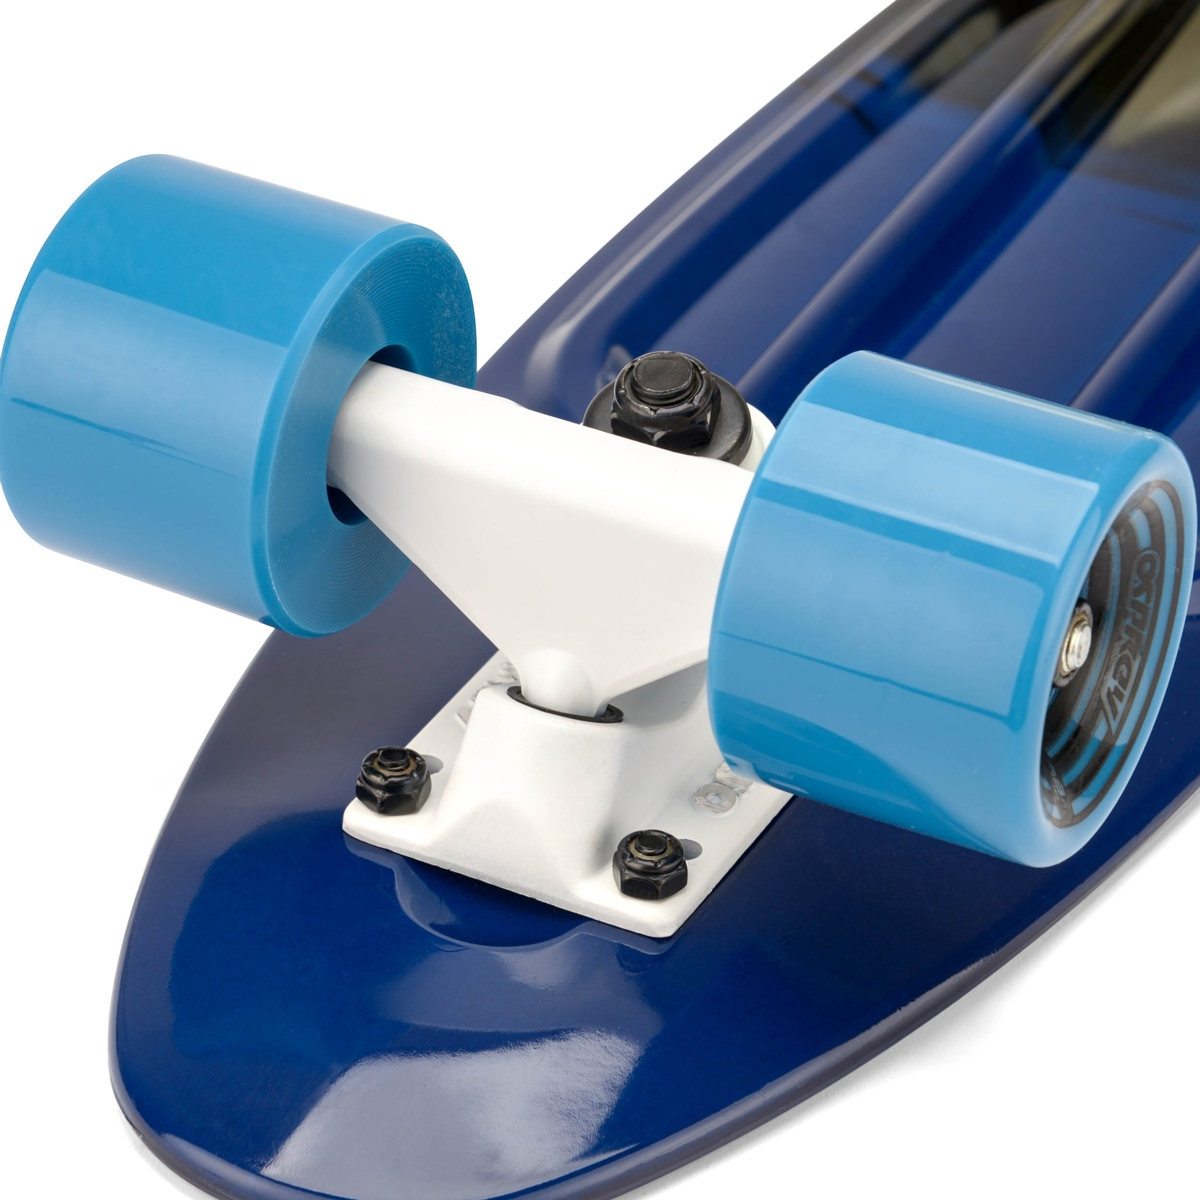 "Osprey Complete Retro Plastic Mini Cruiser Skateboard 22/"" or 27/"""